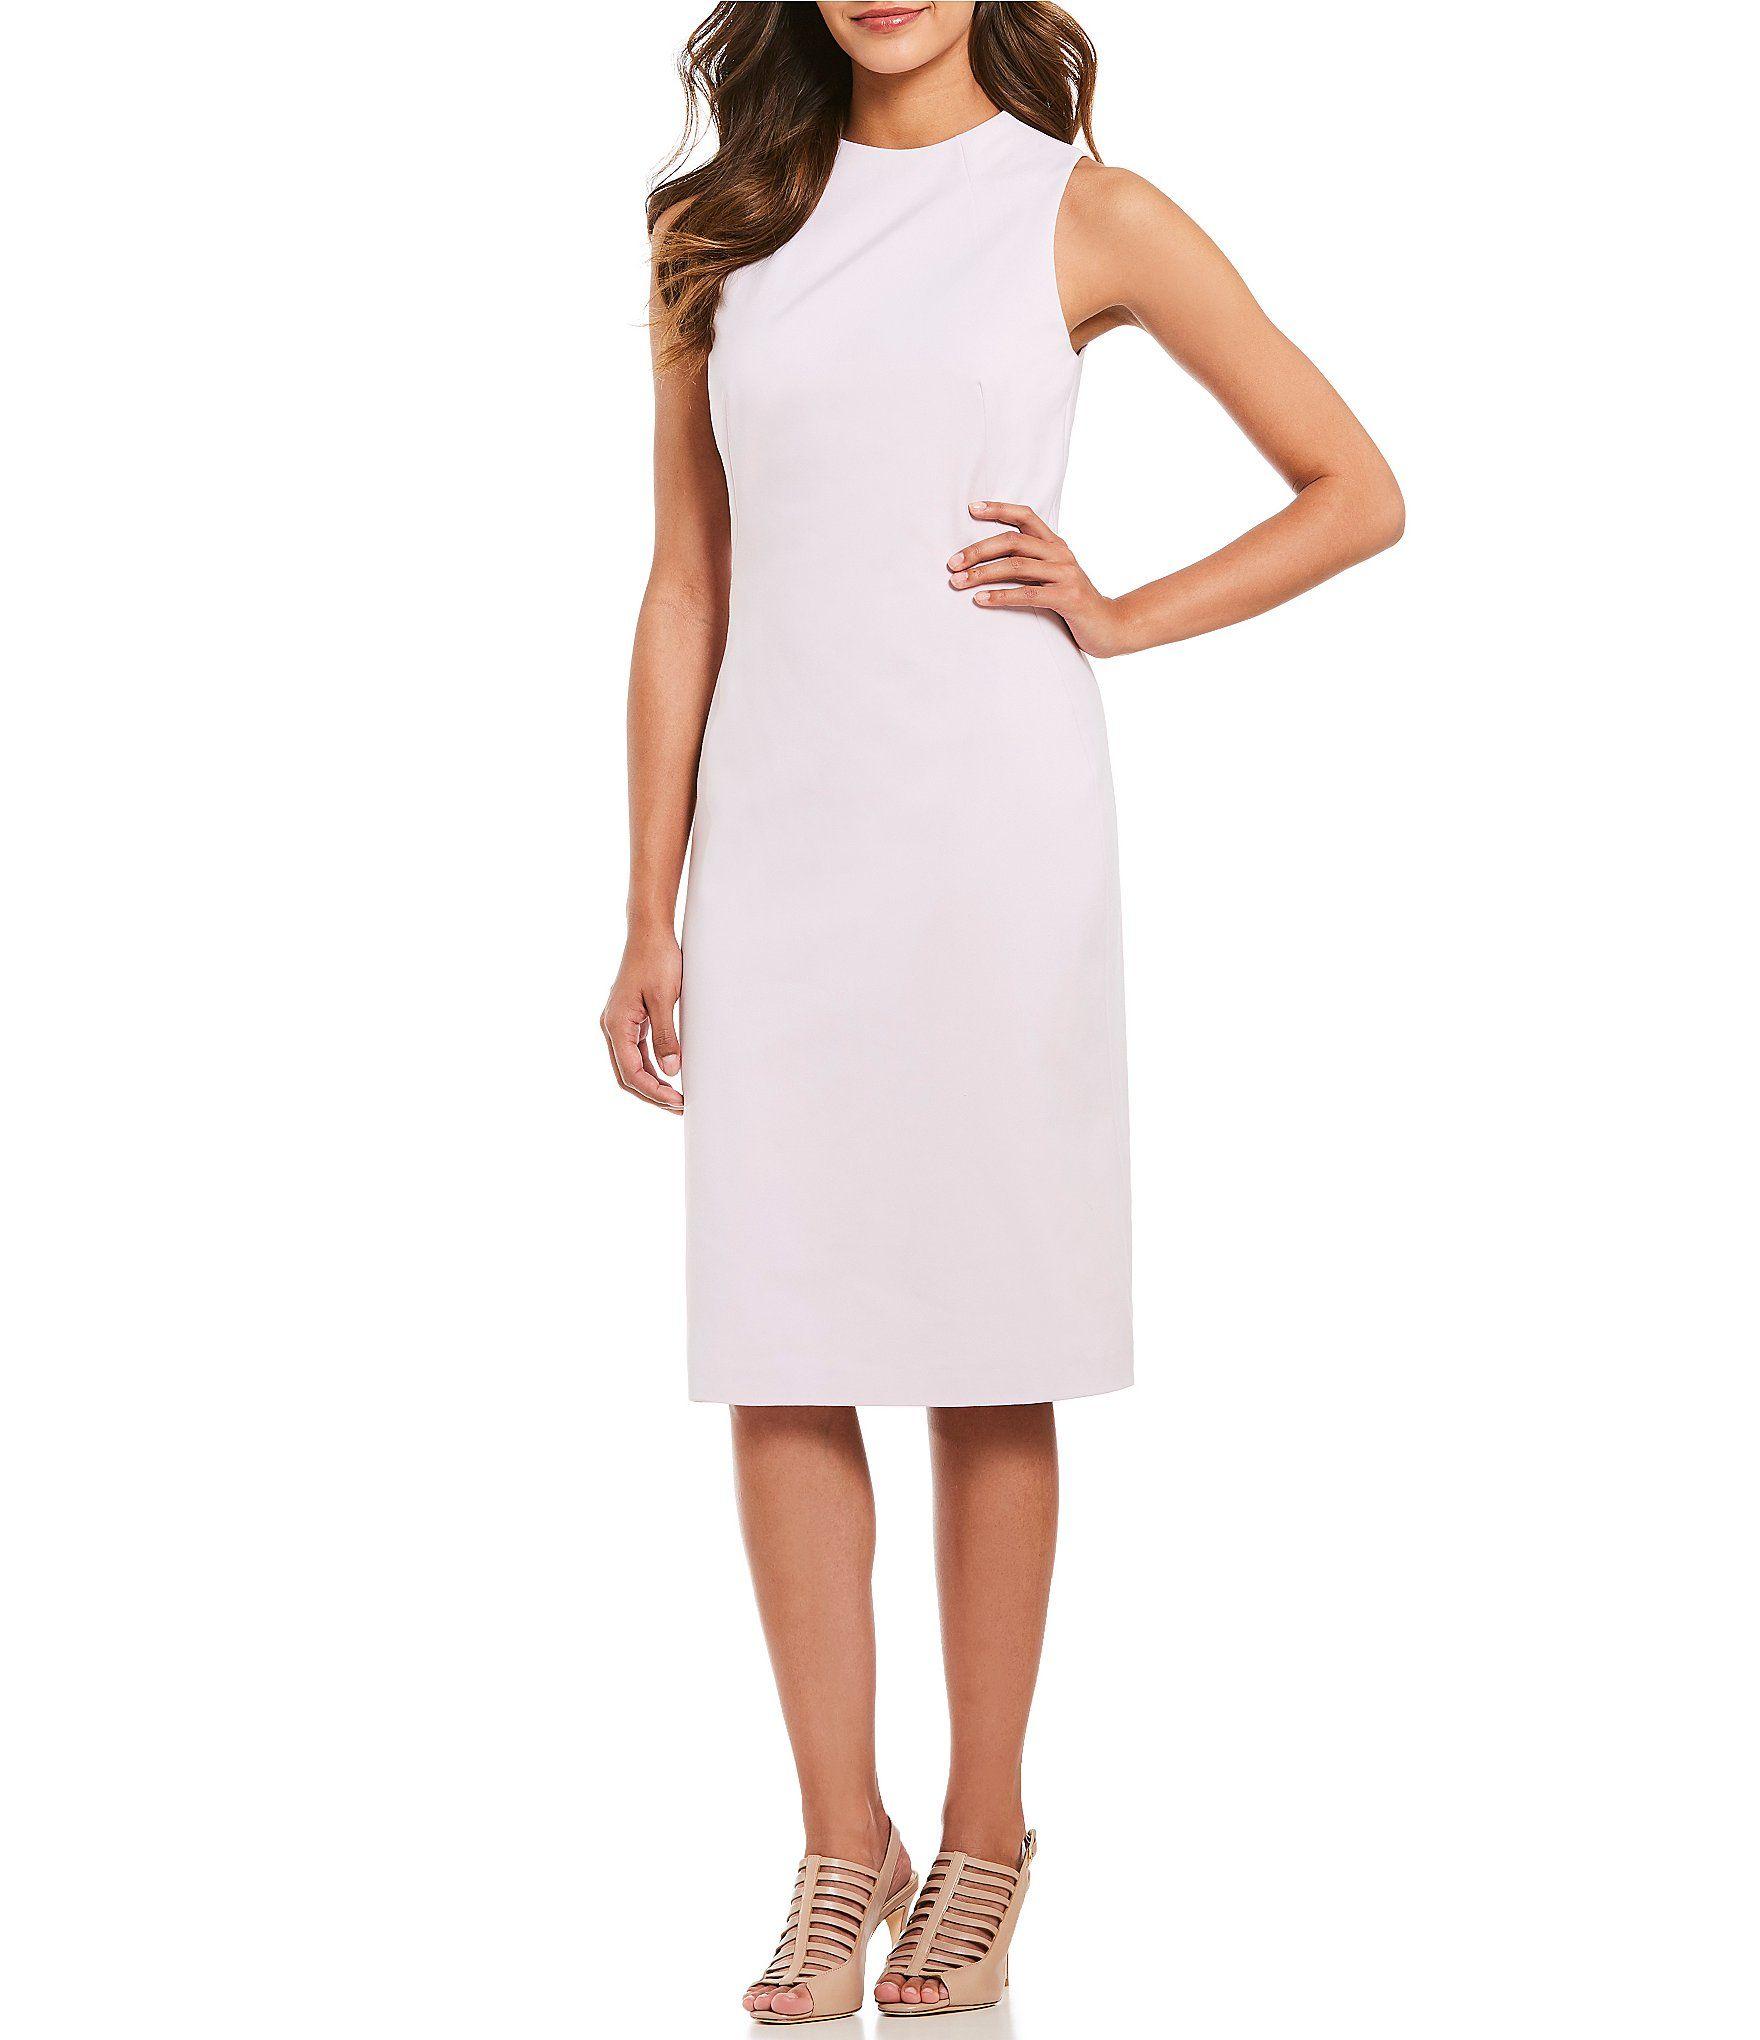 b18047d9eb6 Antonio Melani Lea Sleeveless Sheath Dress